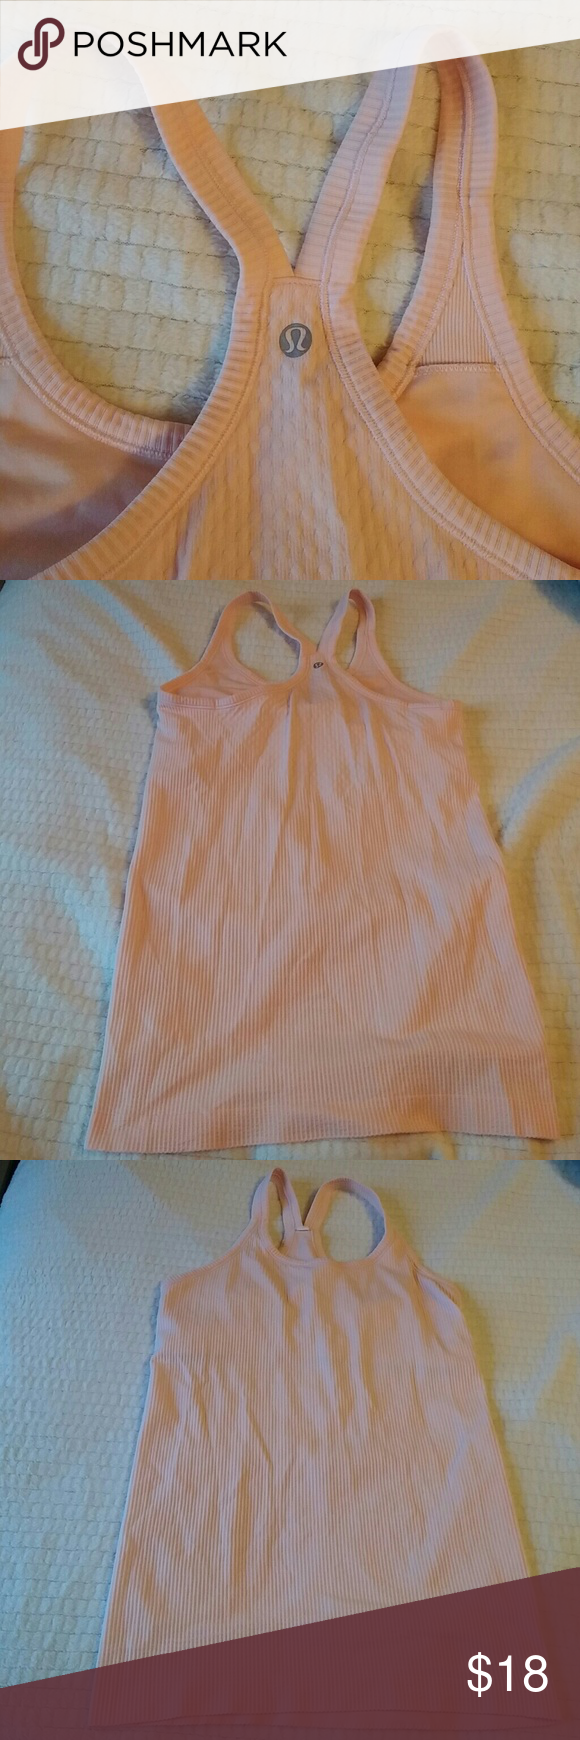 Lululemon Blush pink, great elasticity, ribbed textured. lululemon athletica Tops Tank Tops